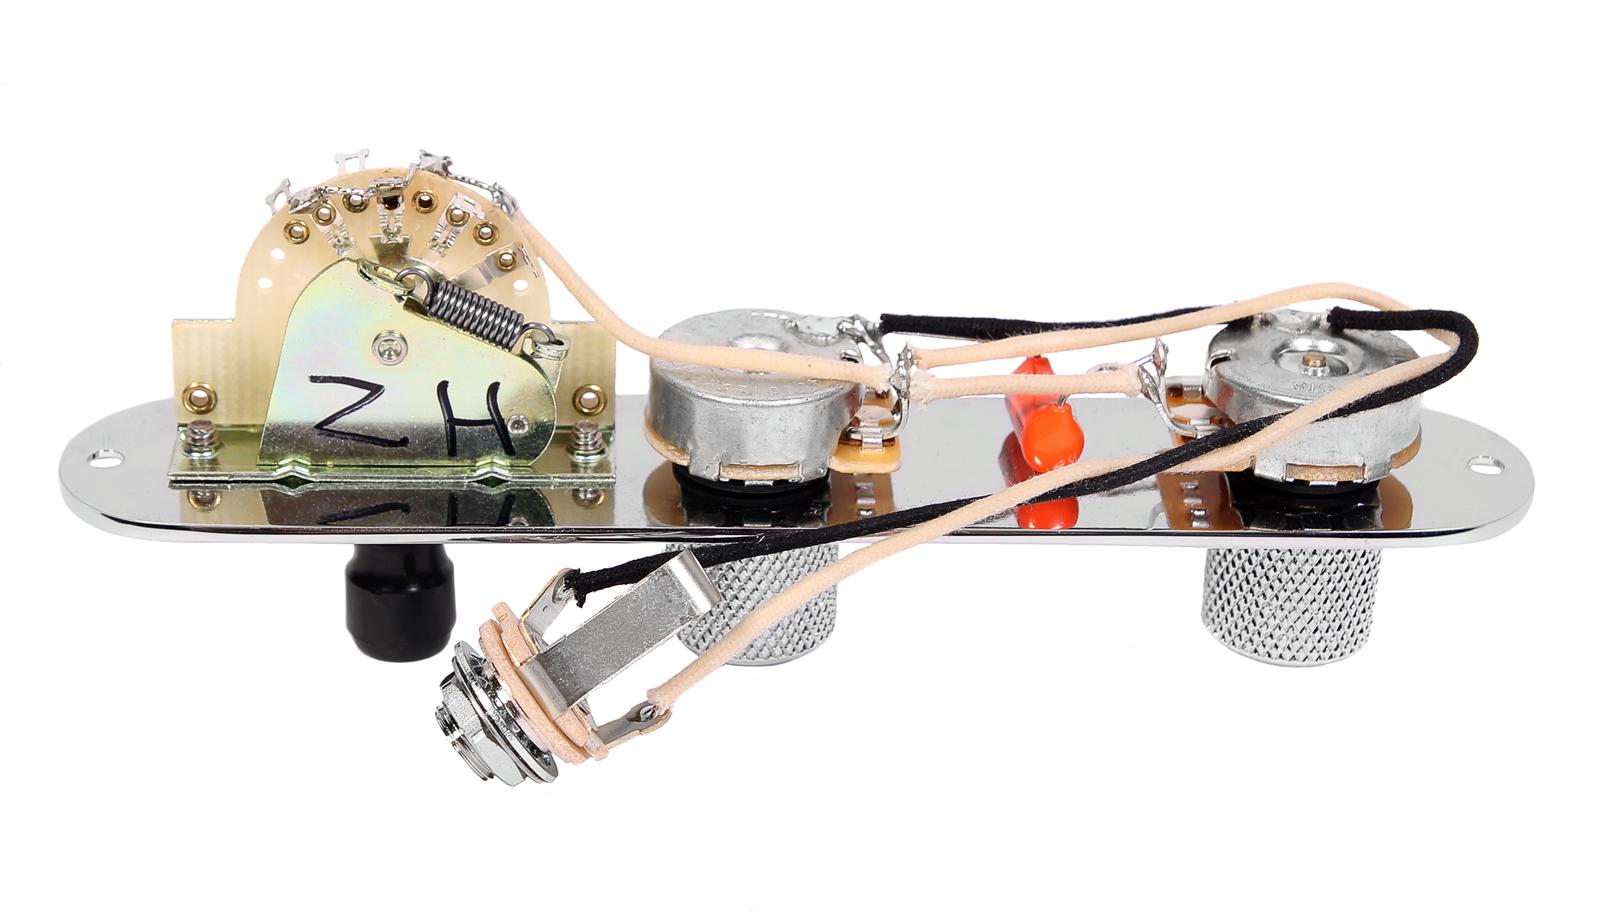 Fender Tele Telecaster Loaded Pre-wired Pickguard DiMarzio Twang King Pickups BK